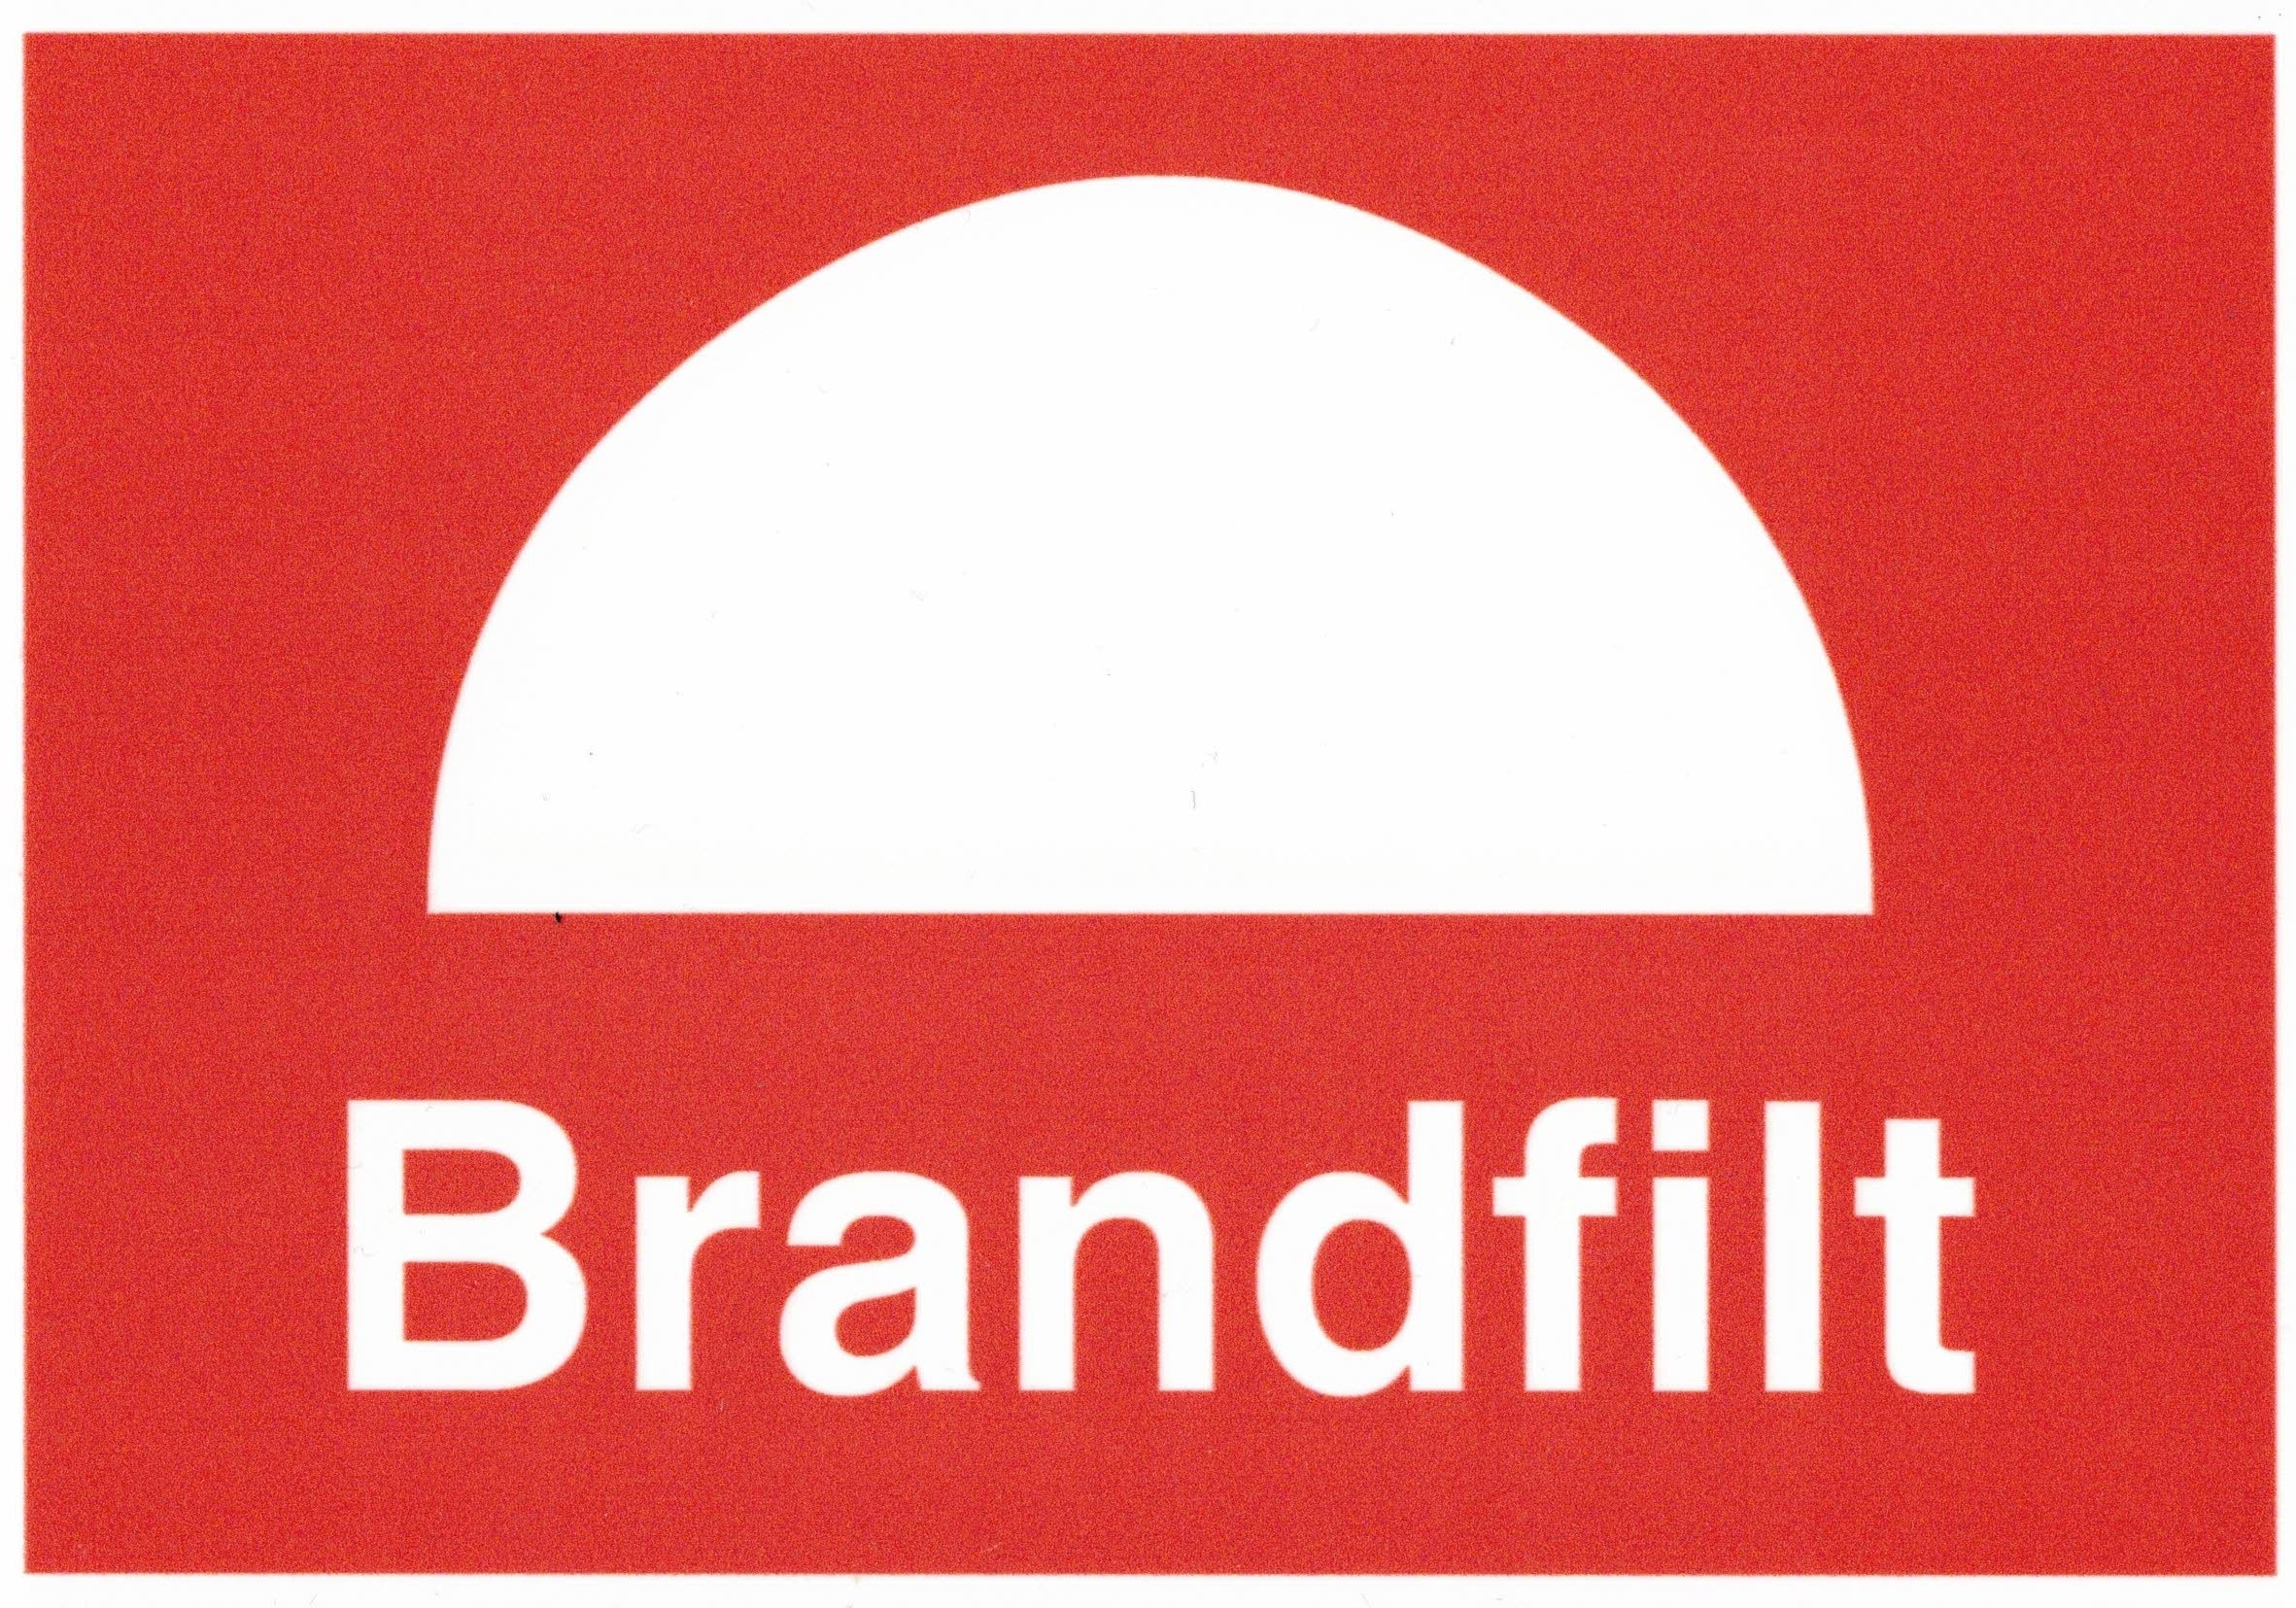 Brandfilt Plast A5_000005